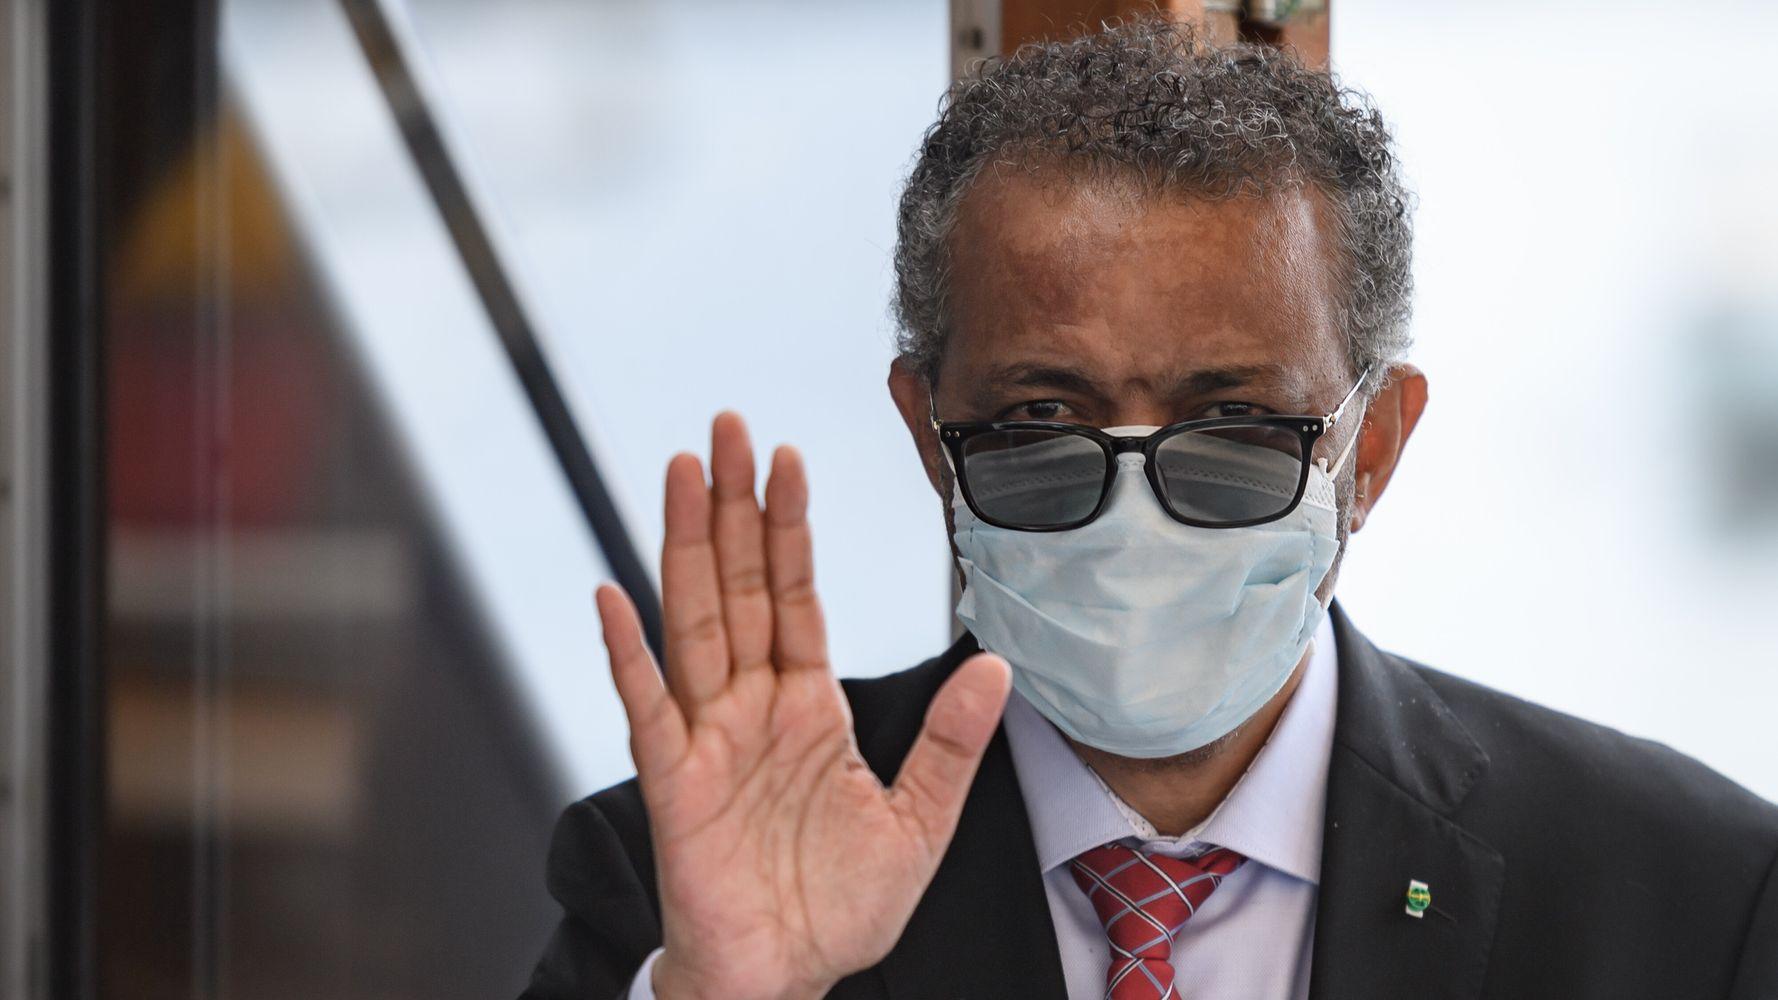 WHO Chief Tedros Adhanom Ghebreyesus Self-Quarantines After Exposure To Coronavirus